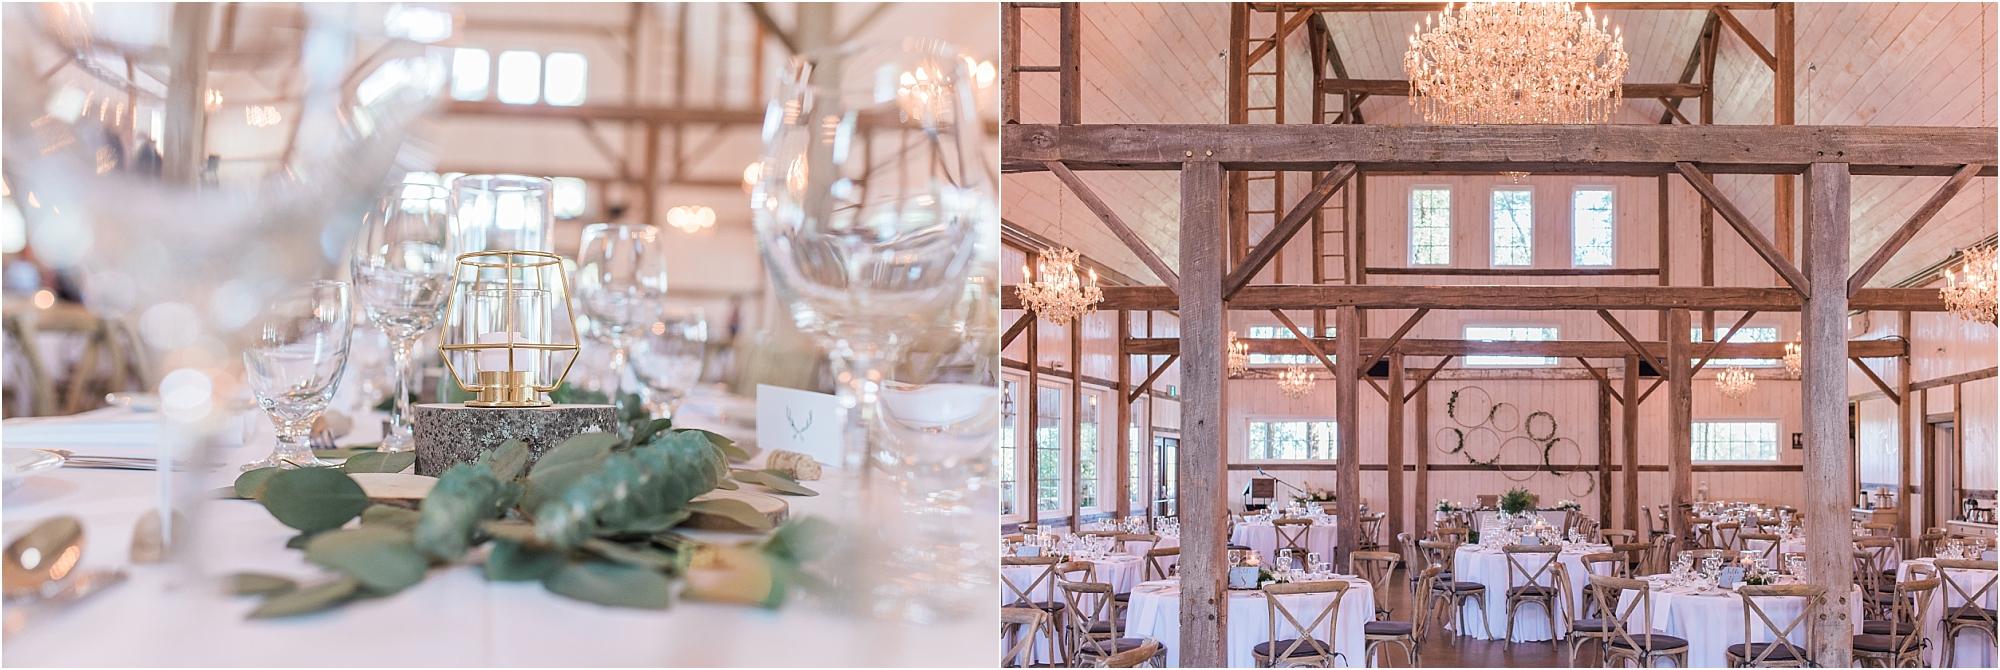 0081 Summer Stonefields Wedding Carleton Place - Ottawa Wedding - Photography by Emma_WEB.jpg